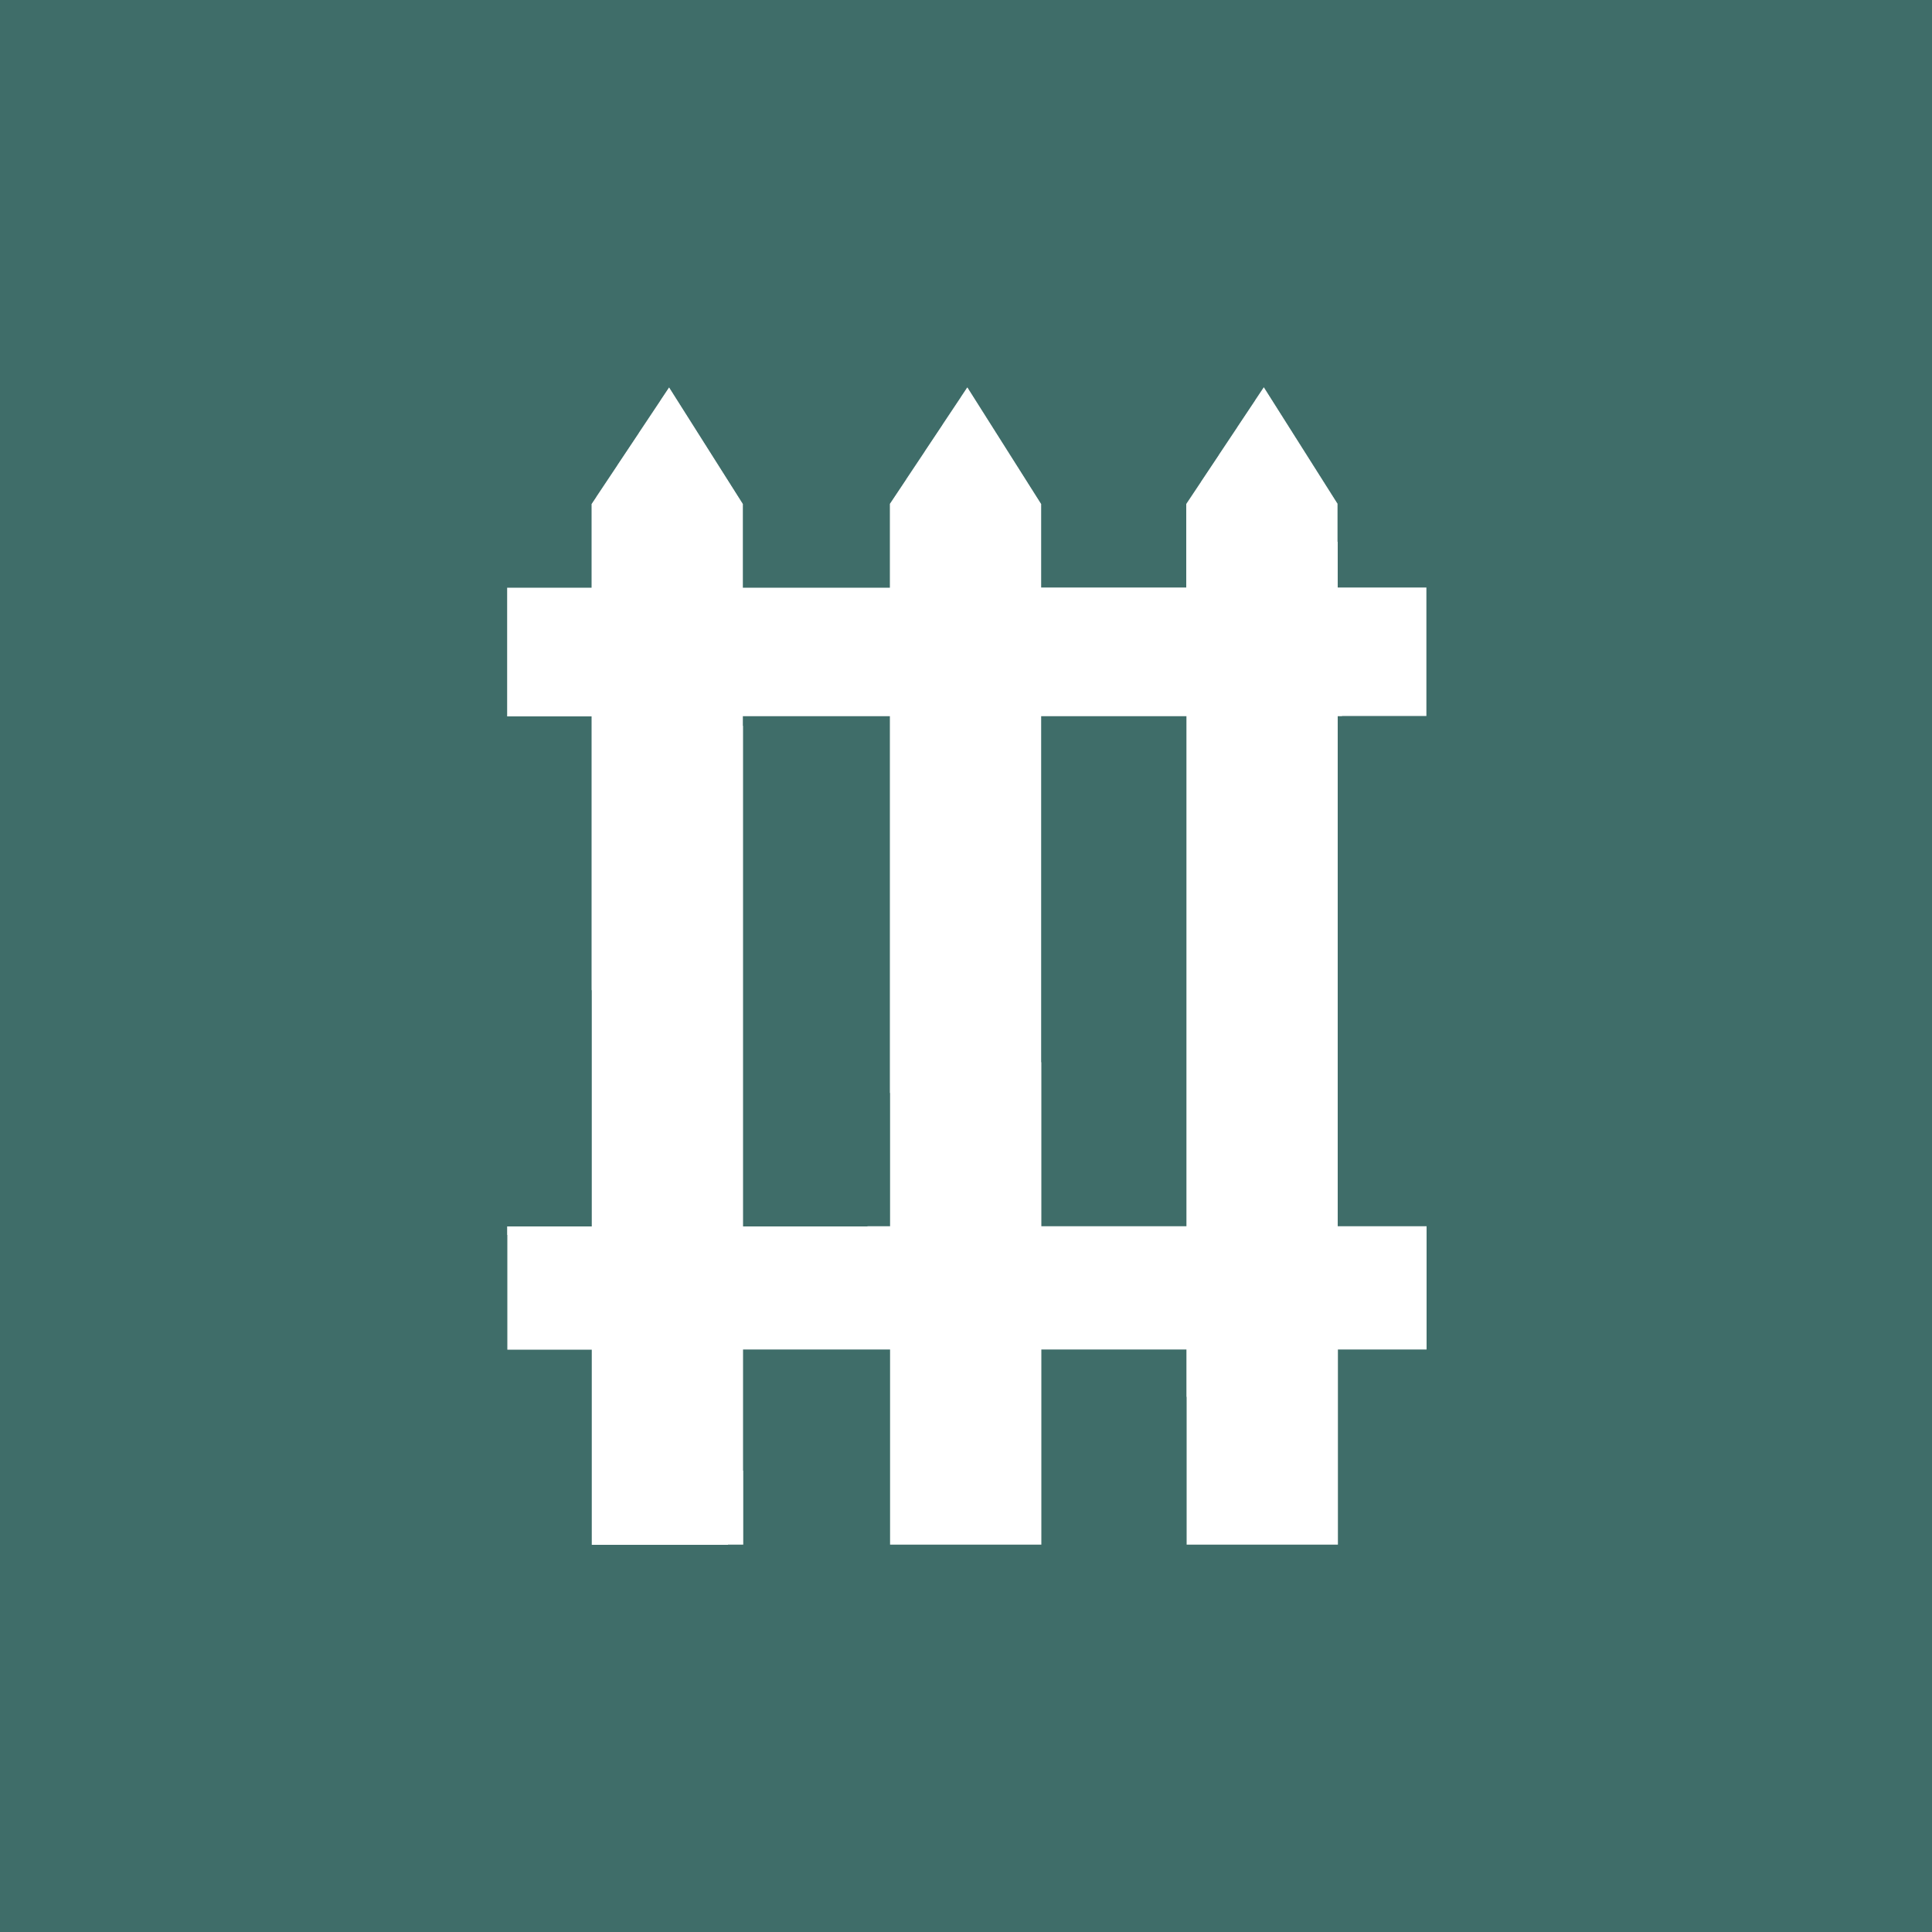 170817_Logotype-Logomark_mark - social media.png